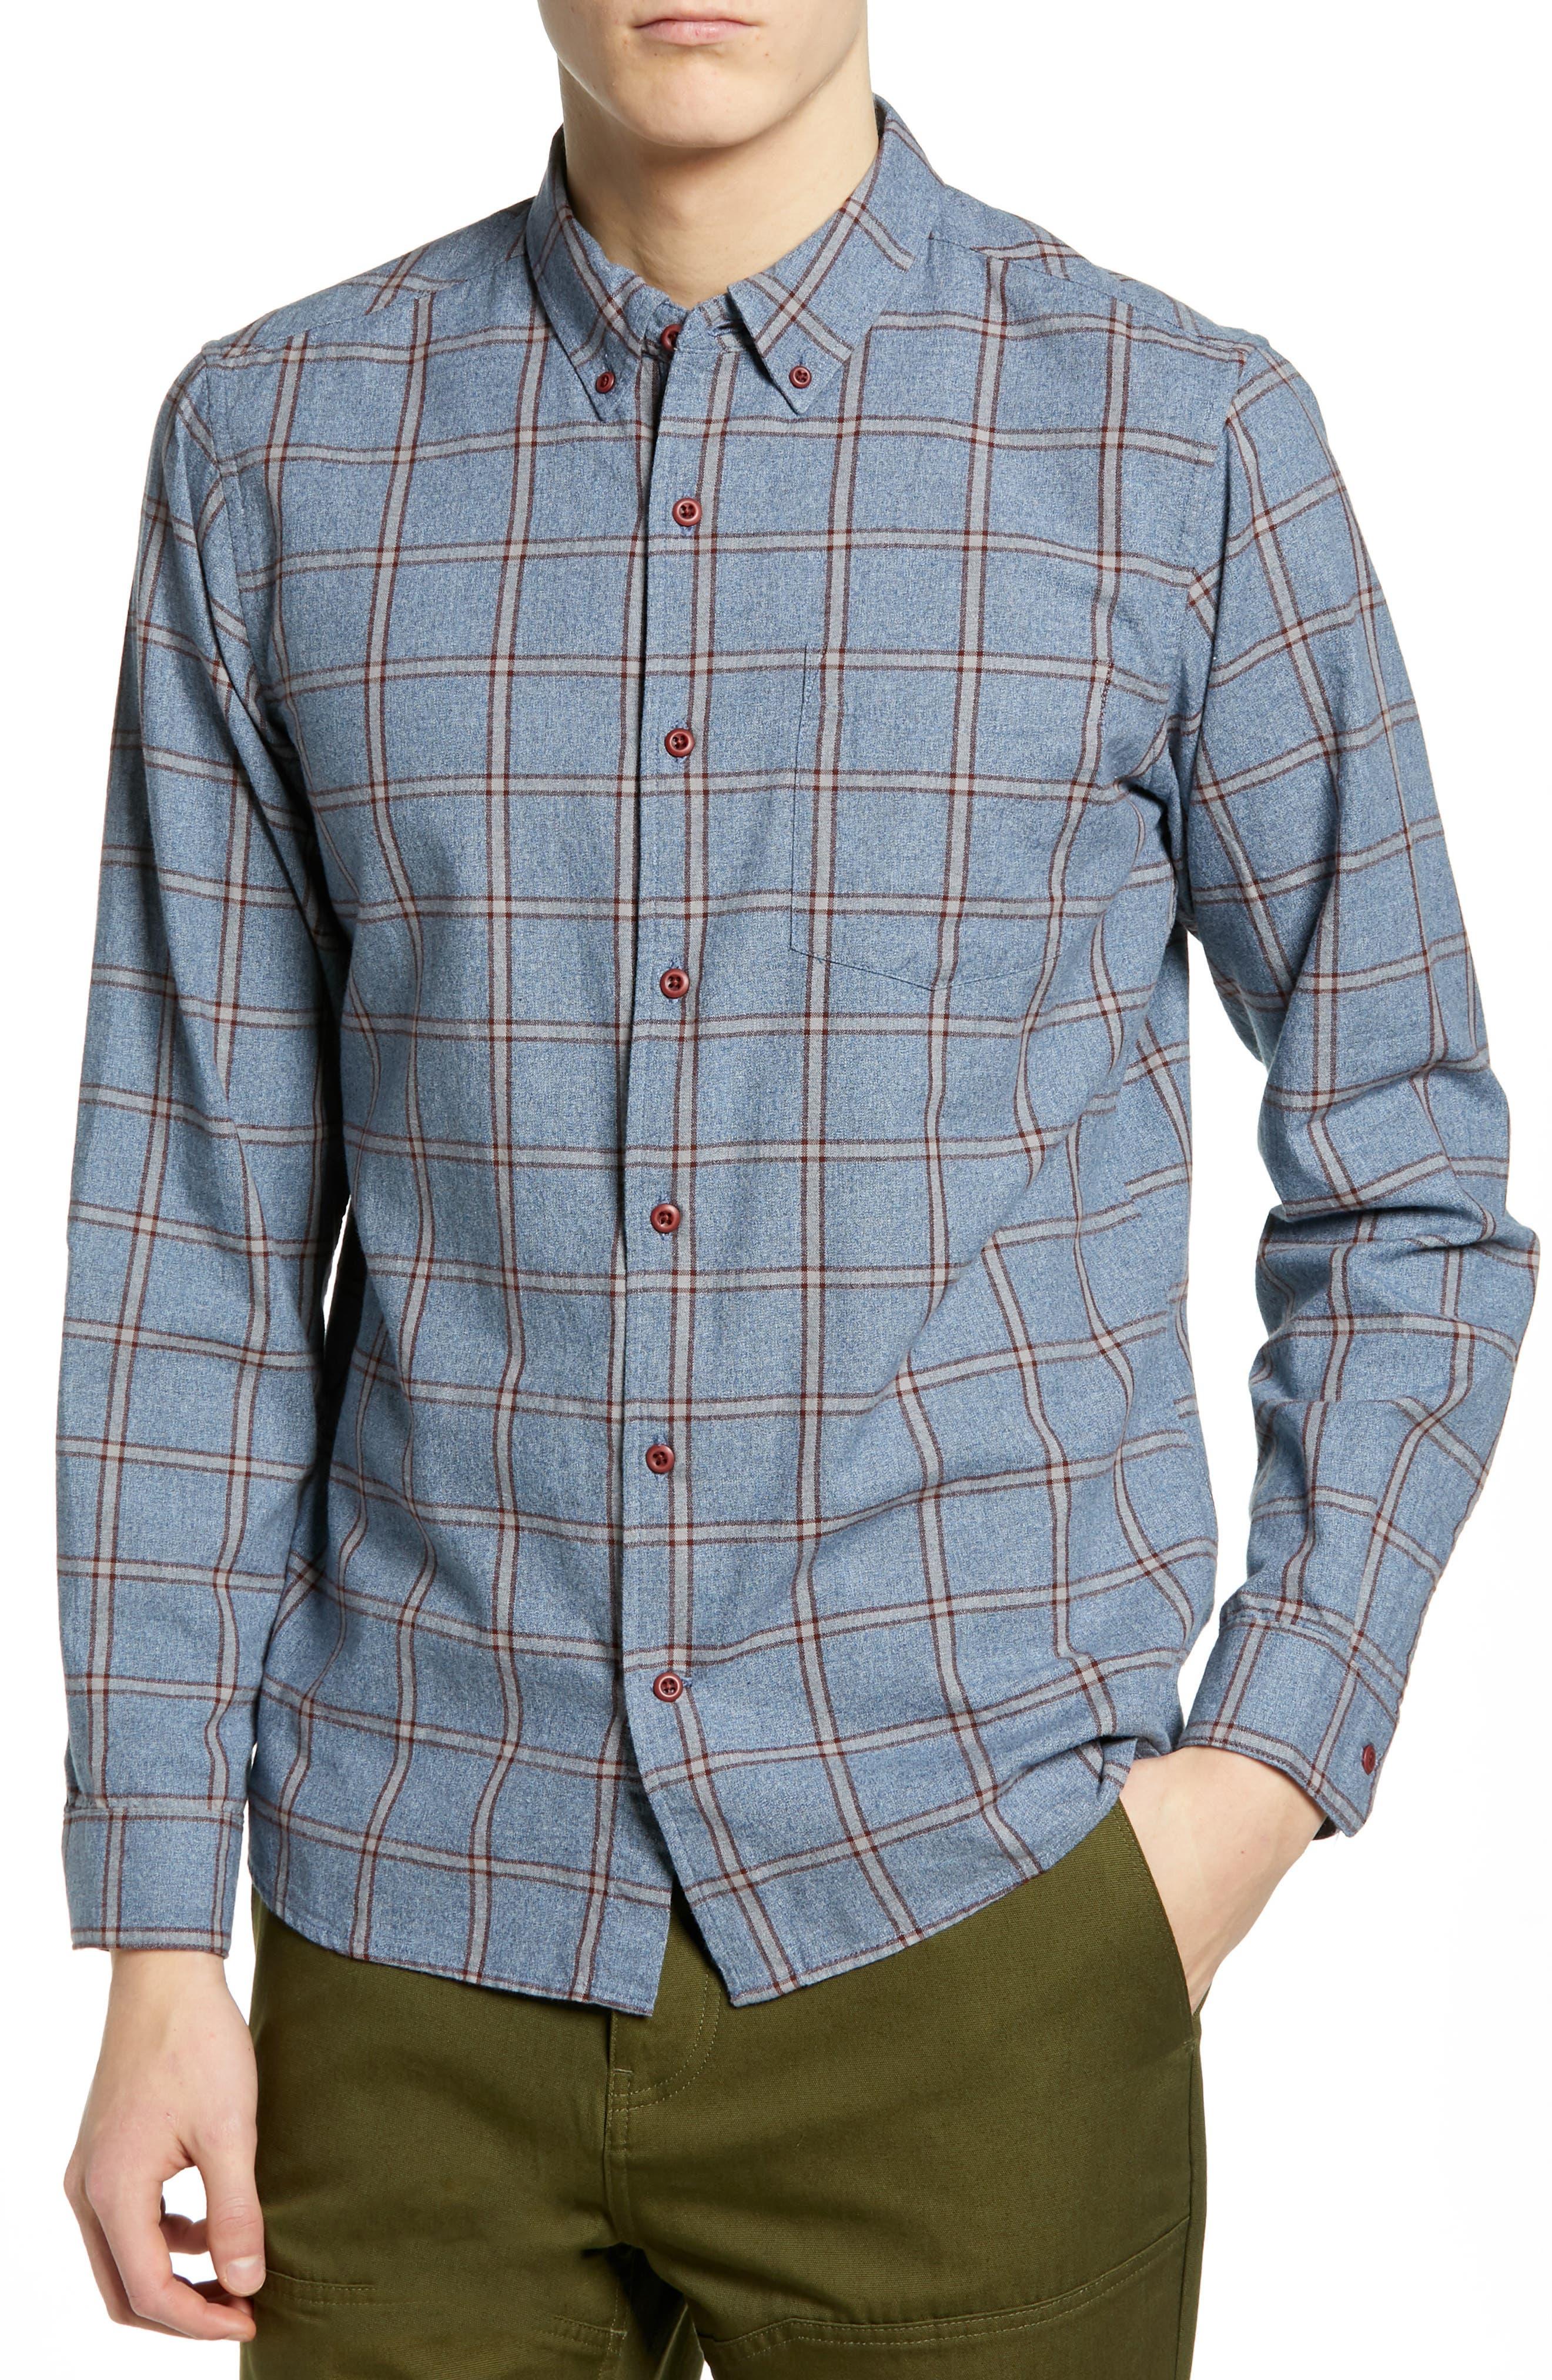 Hurley Towns Plaid Sport Shirt, Blue/green